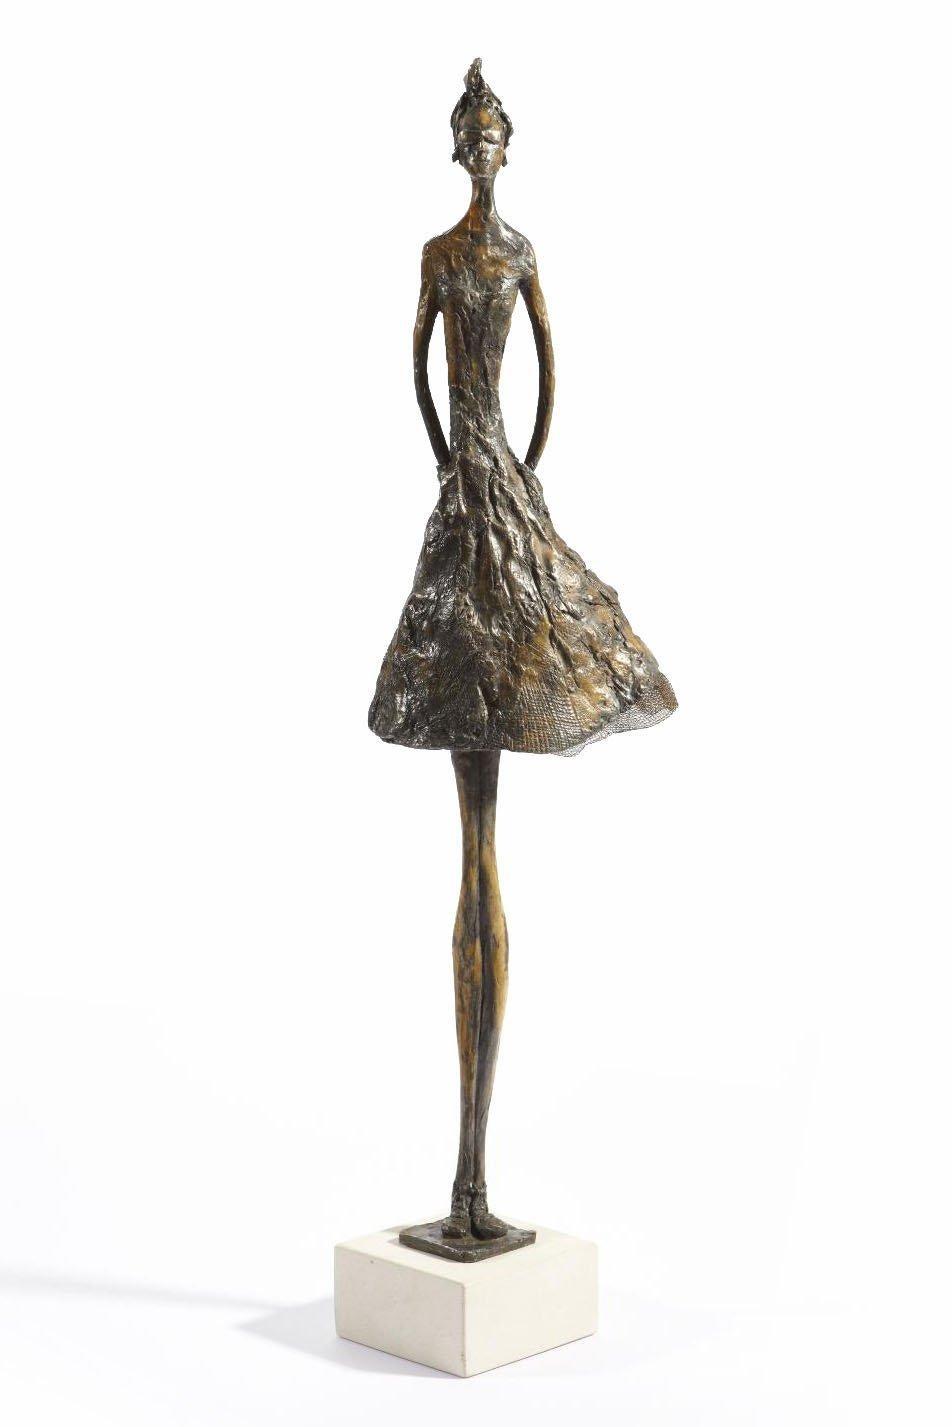 Jersey Lily - slim figurative bronze statue